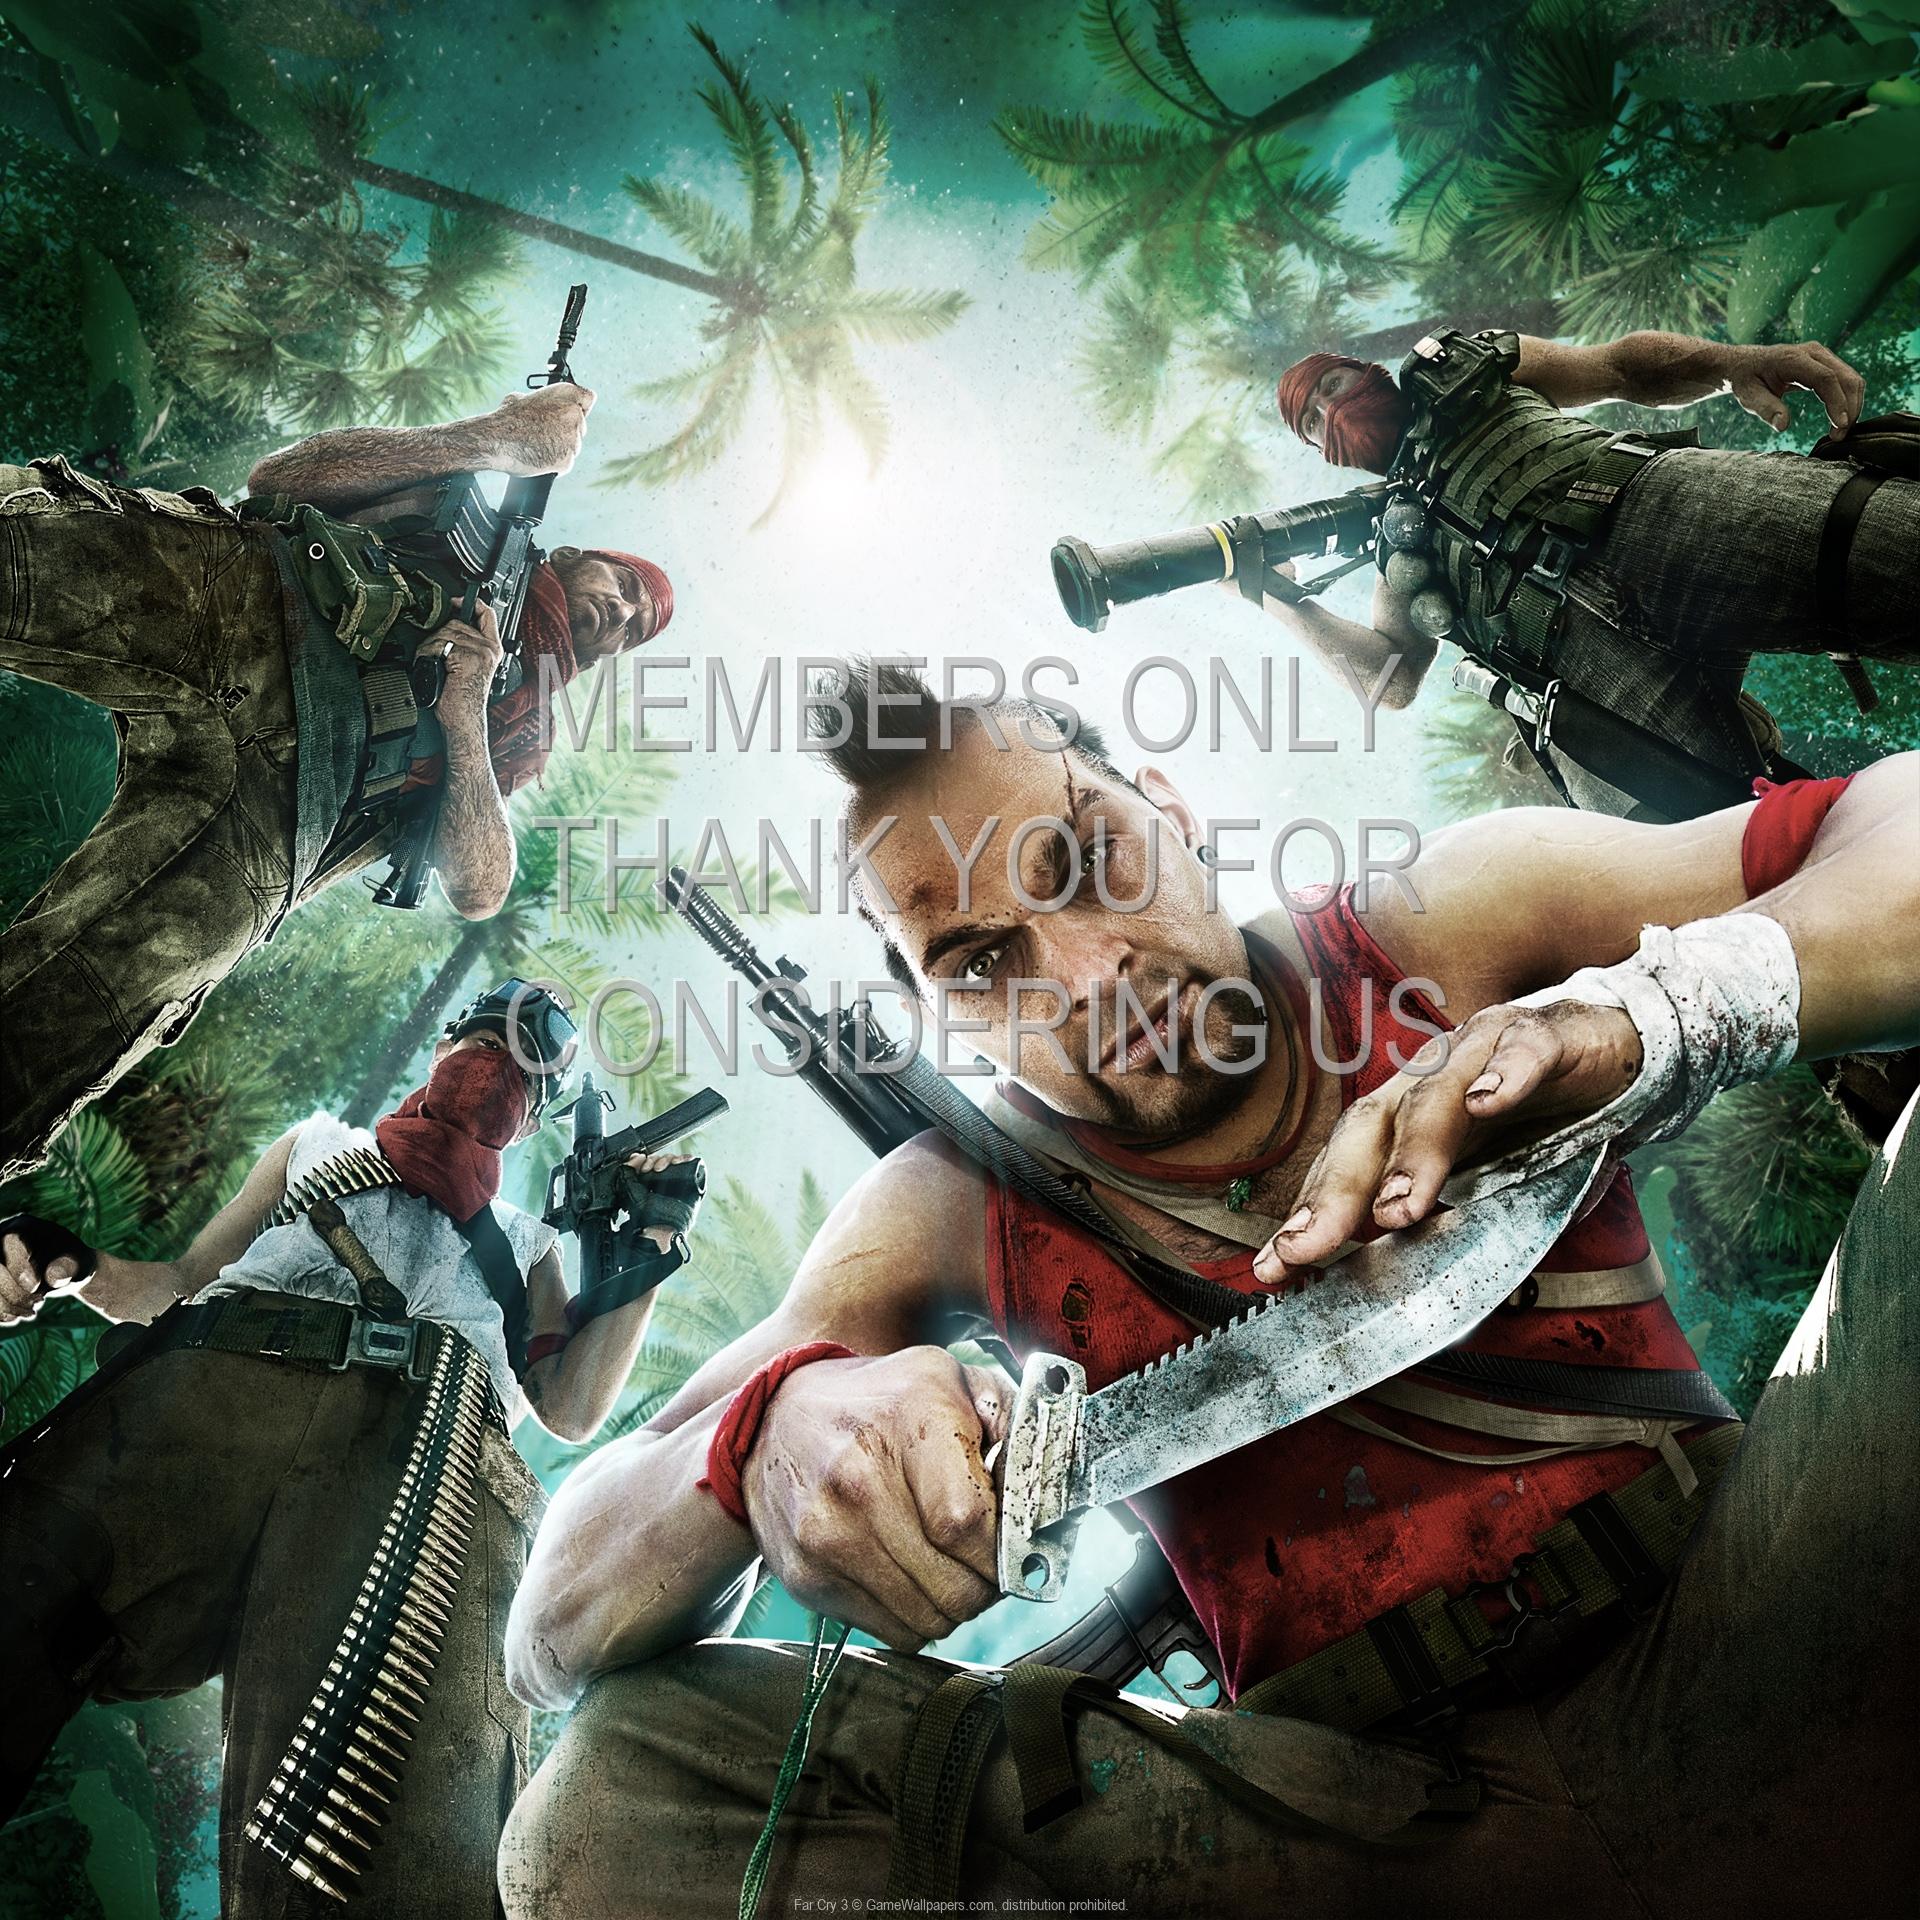 Far Cry 3 Wallpaper 04 1920x1080